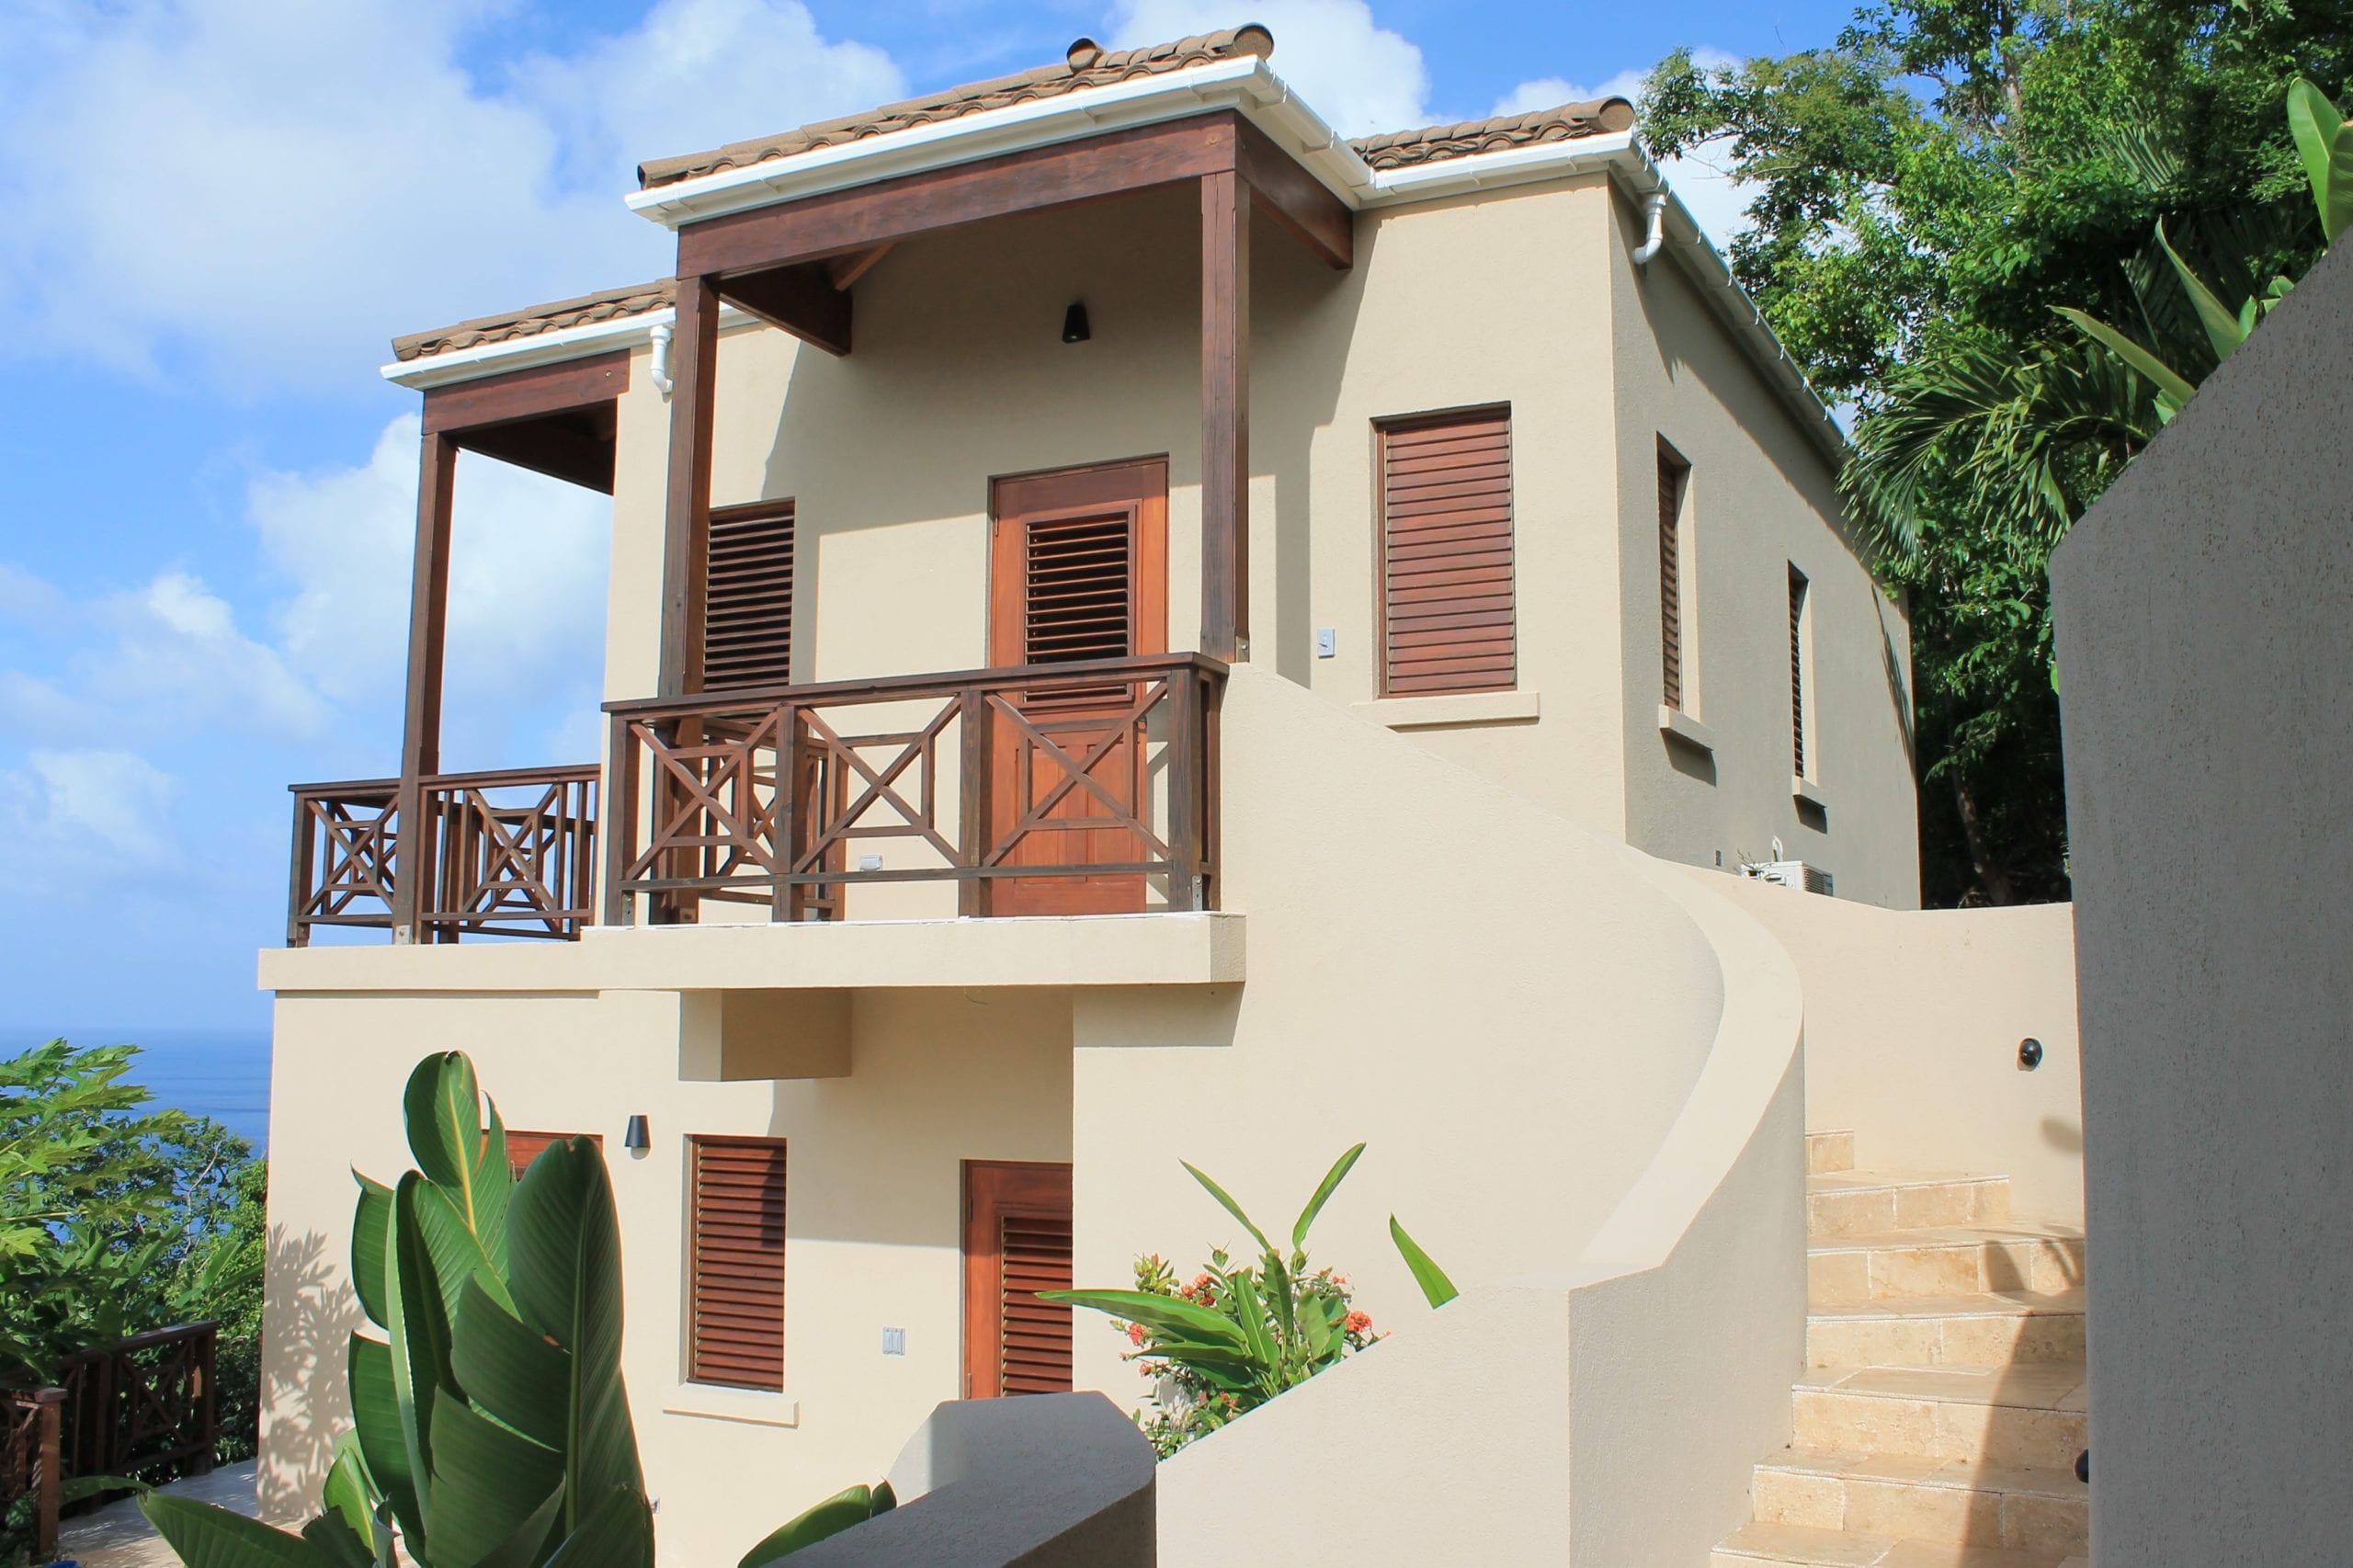 property image # 2